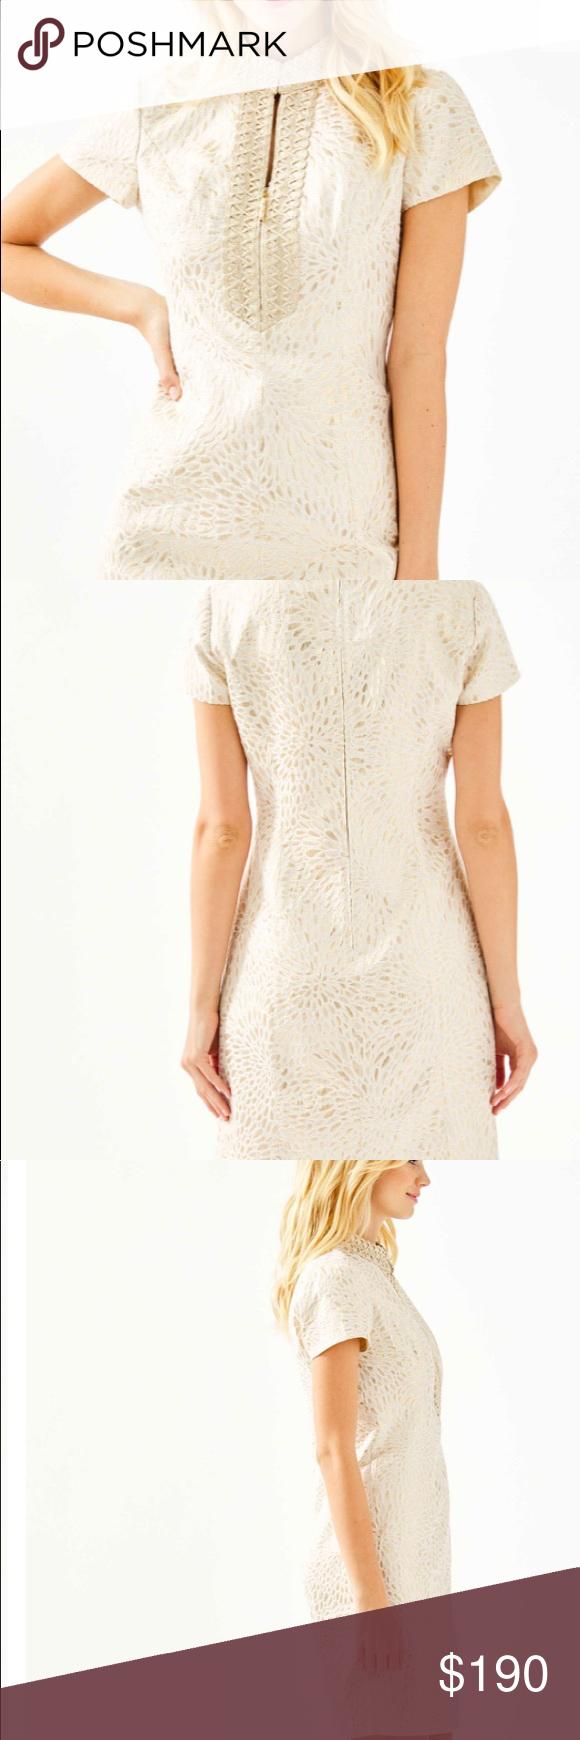 Lilly Pulitzer Adrena High Collar Shift Dress Shift Dress Short Dresses Dresses [ 1740 x 580 Pixel ]